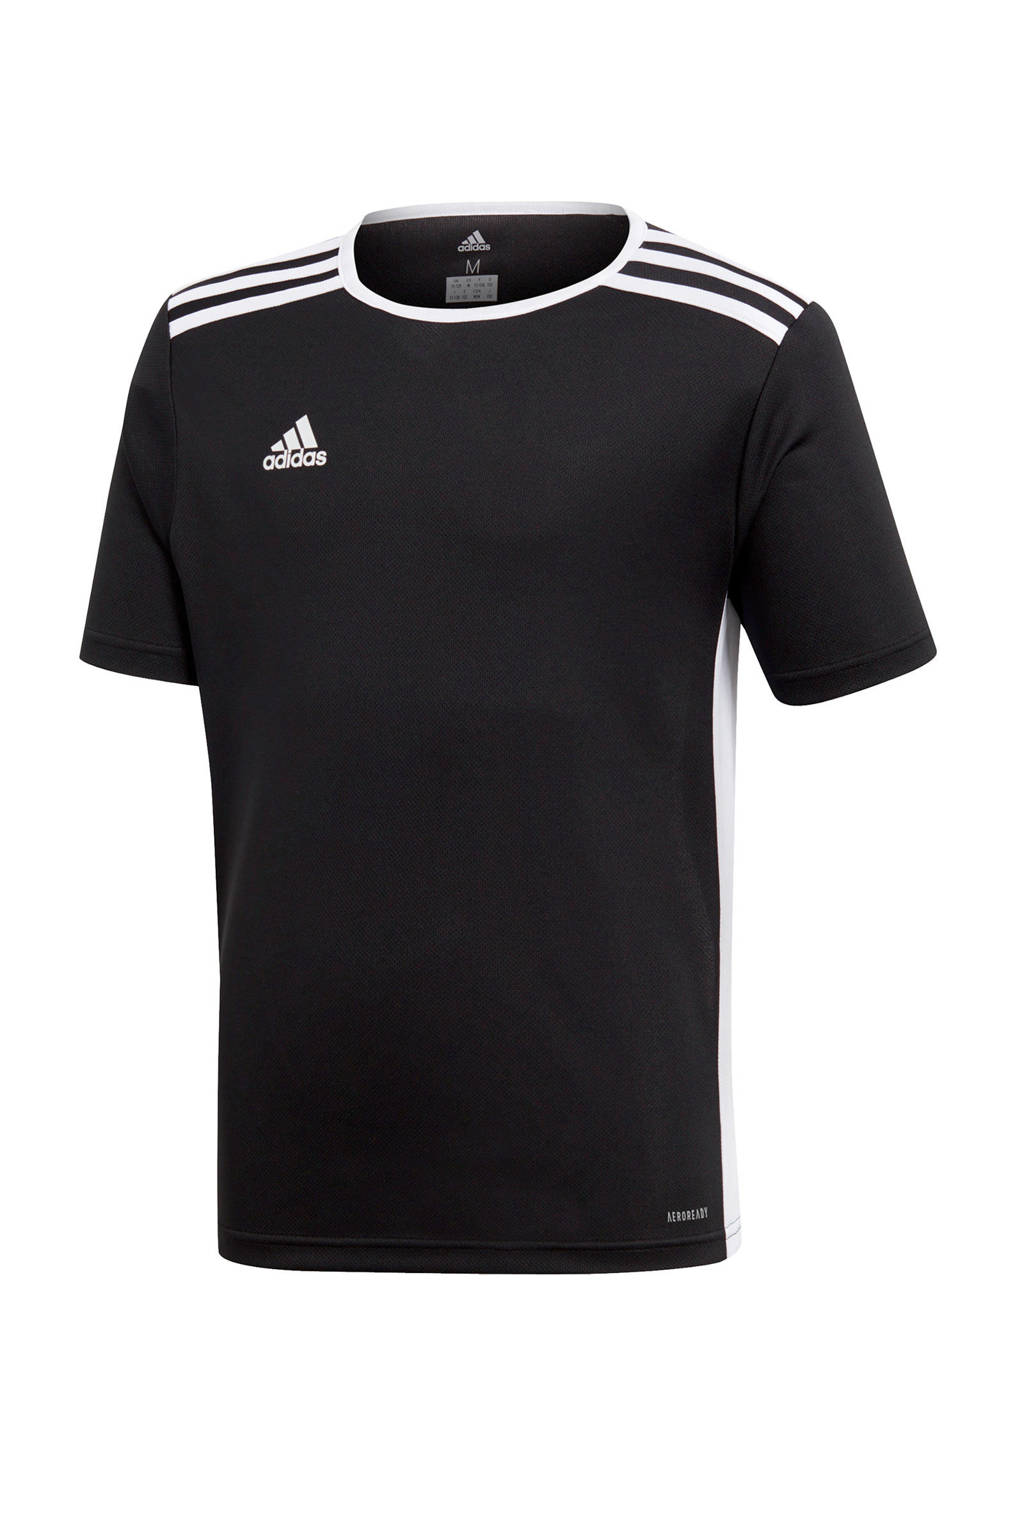 adidas Performance Junior  voetbalshirt zwart, Zwart